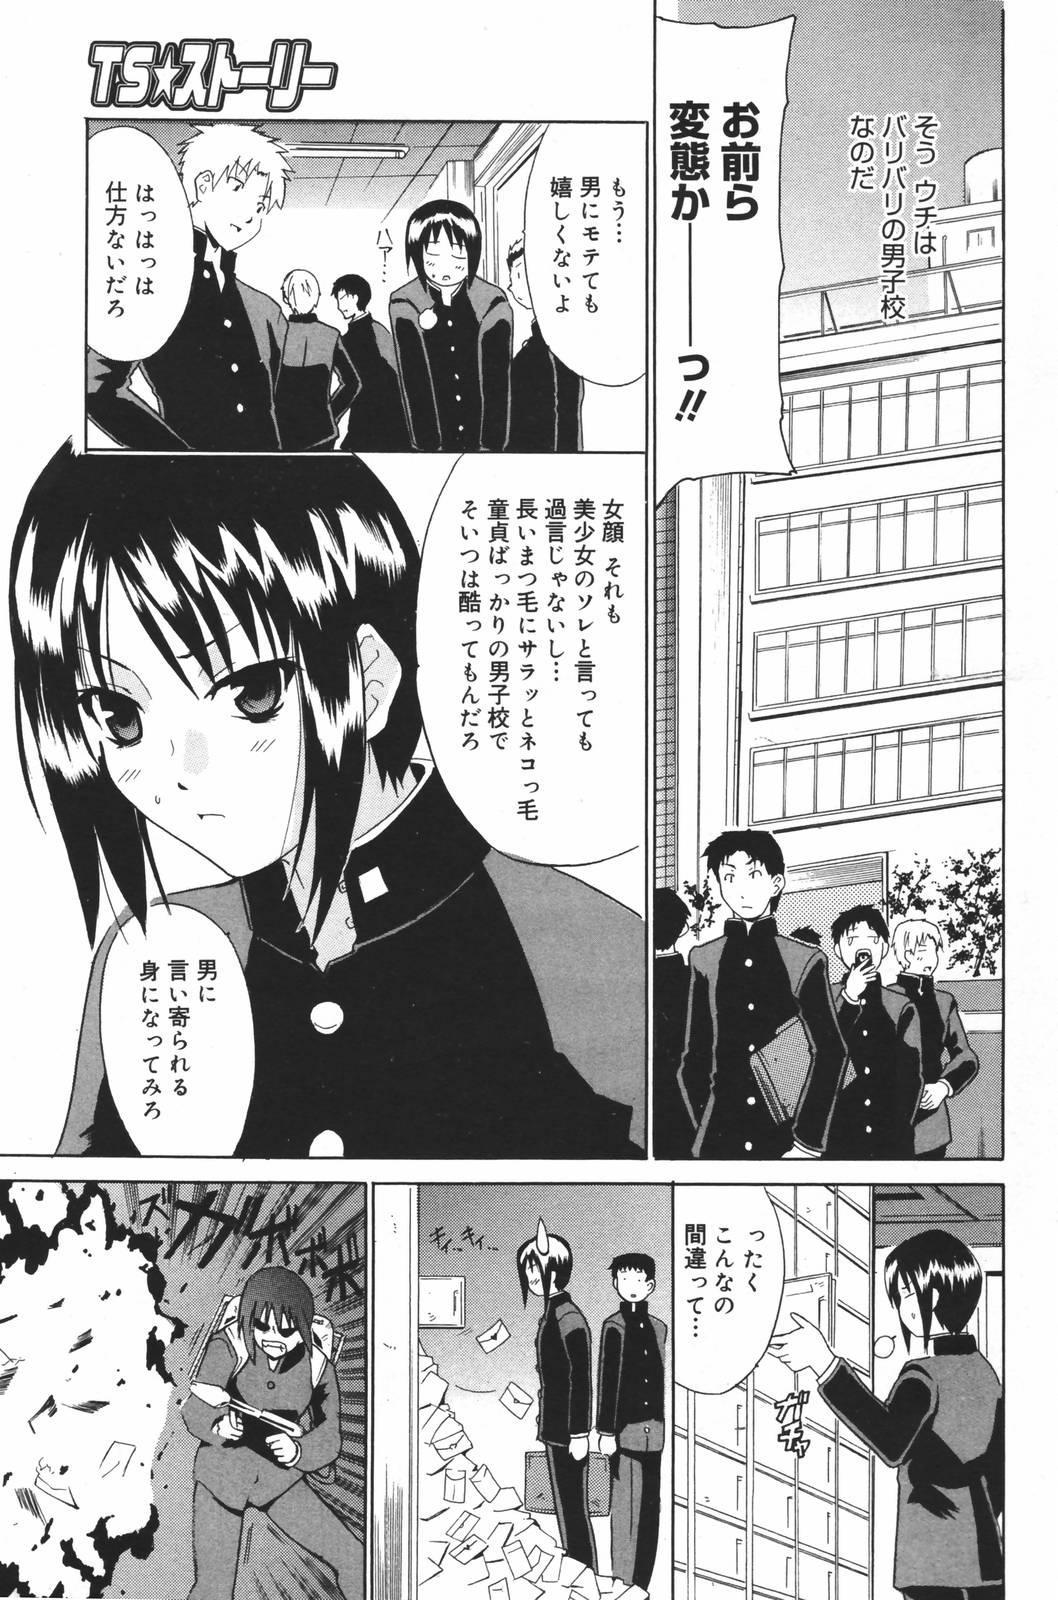 Manga Bangaichi 2007-03 58